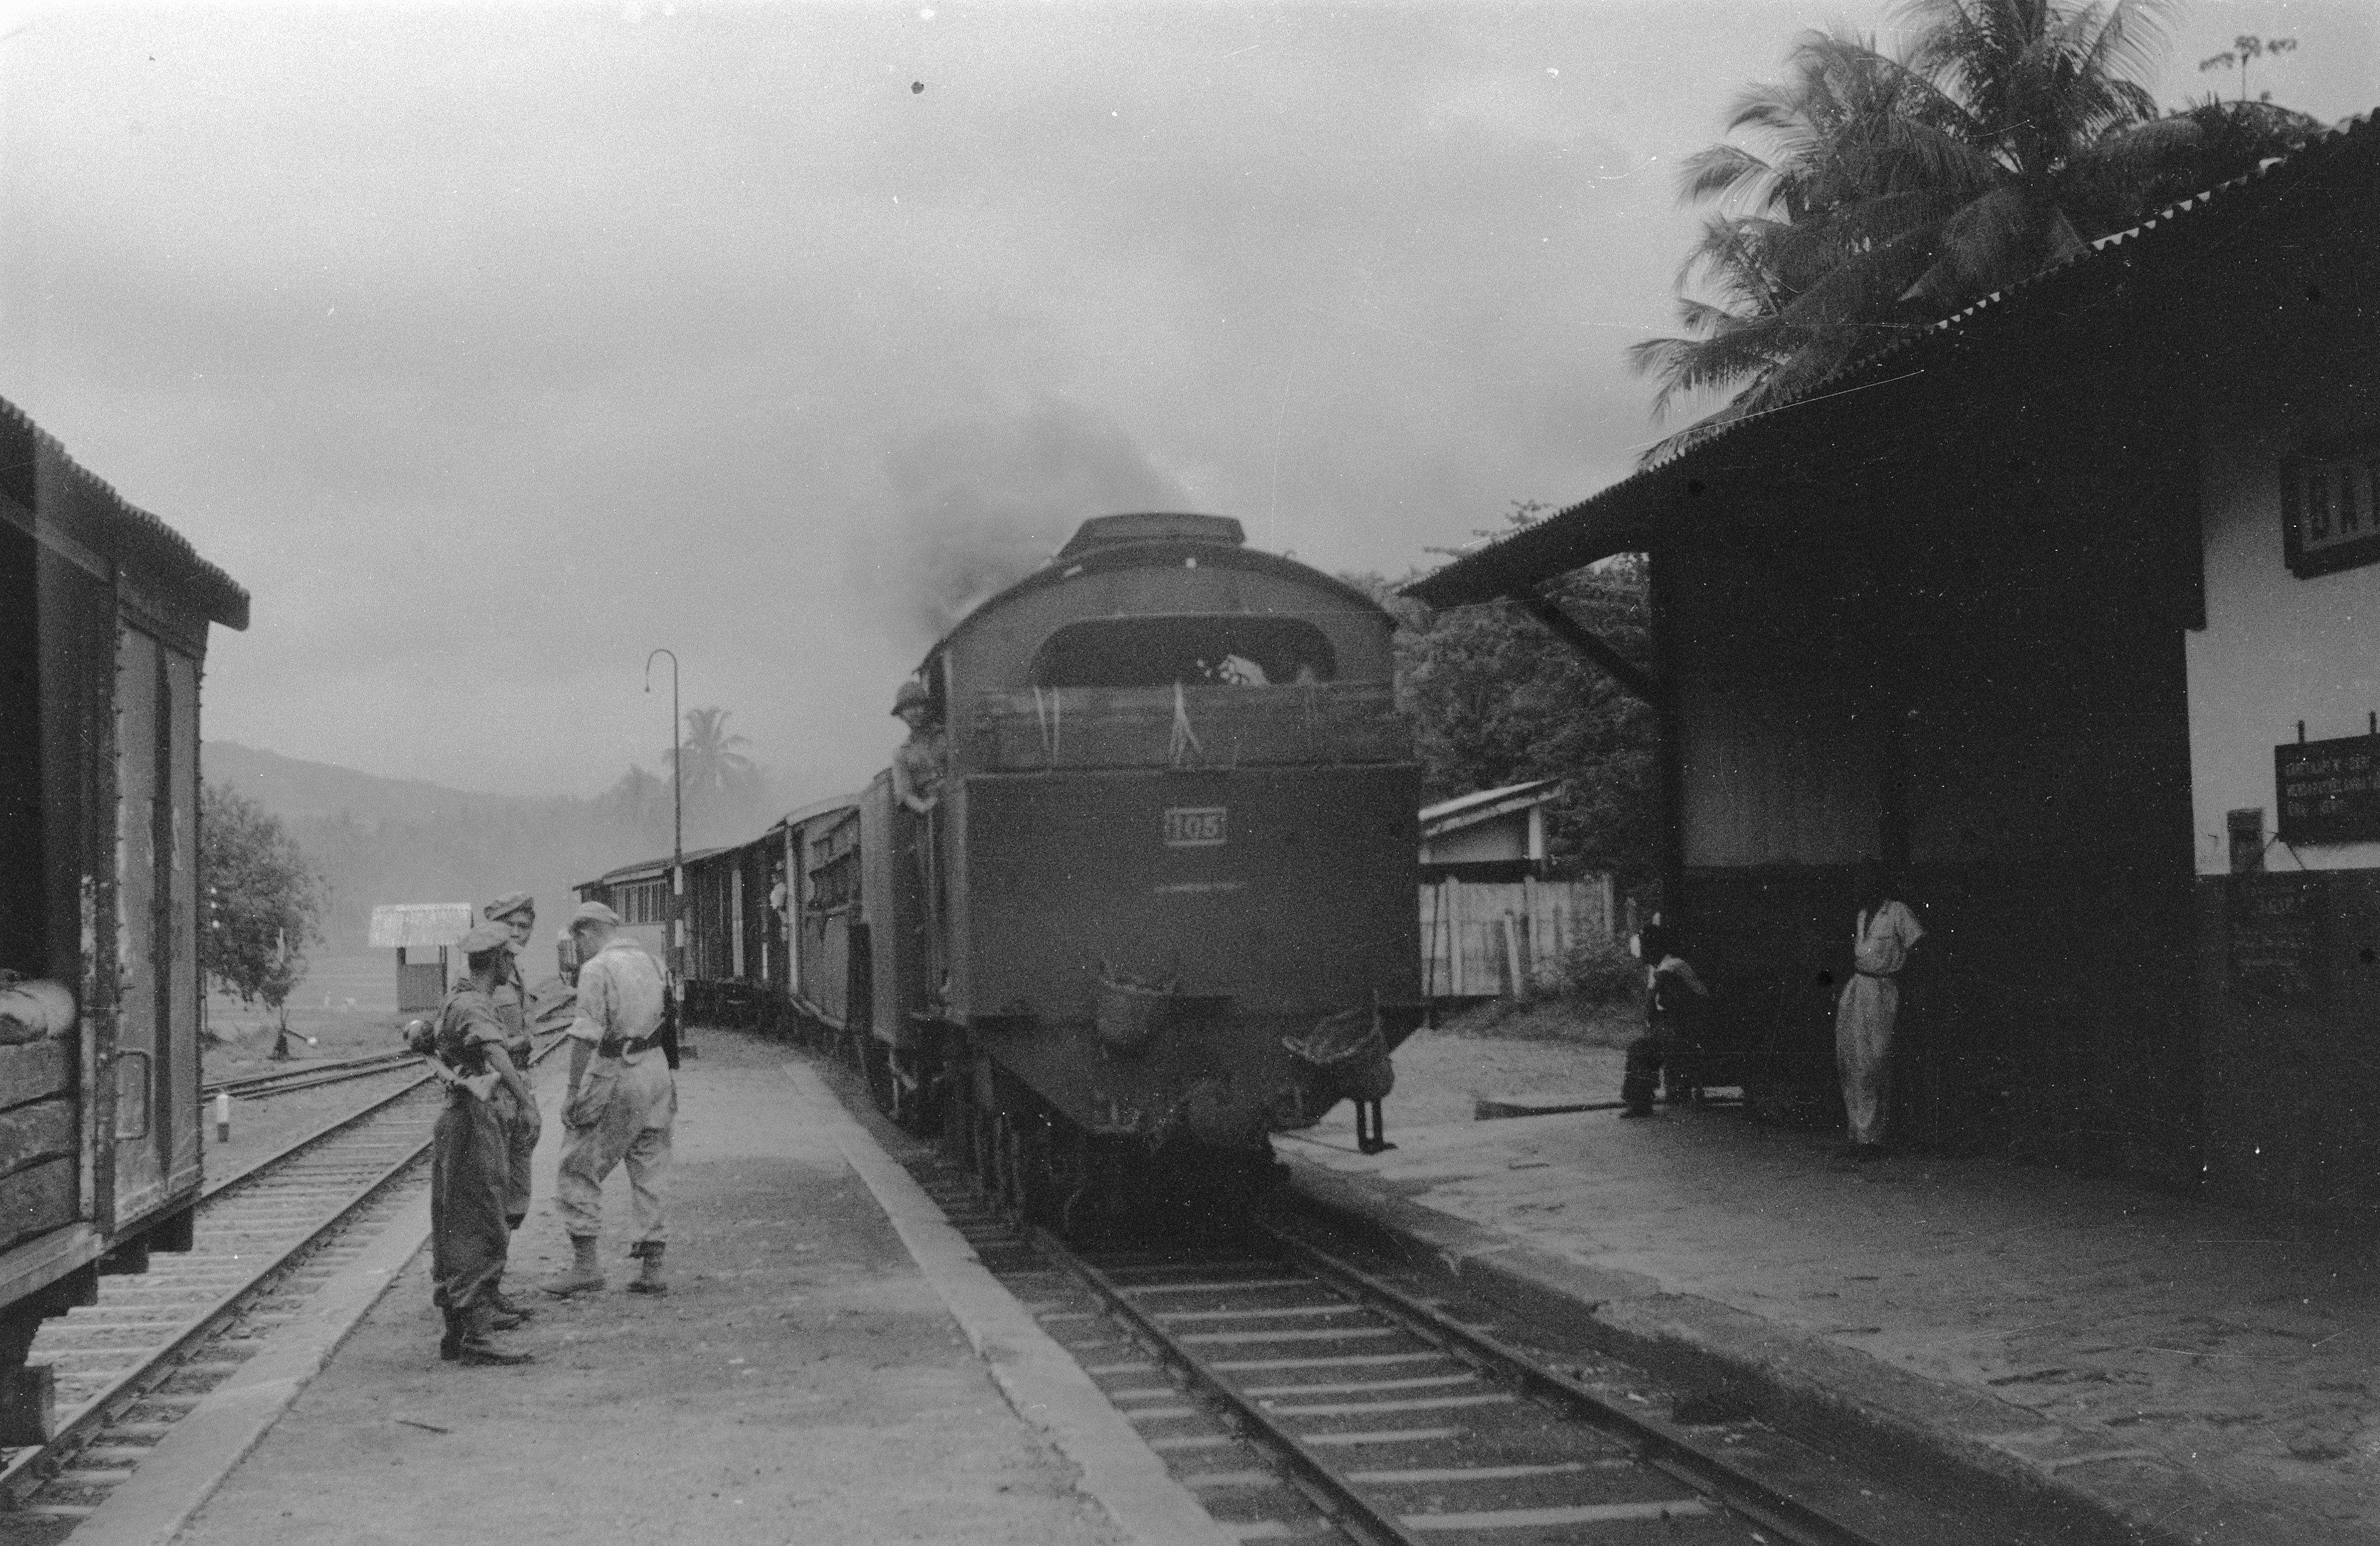 Gambar Kereta Api Thomas Hitam Putih Stasiun Batu Tabal Wikipedia Bahasa Indonesia Ensiklopedia Bebas